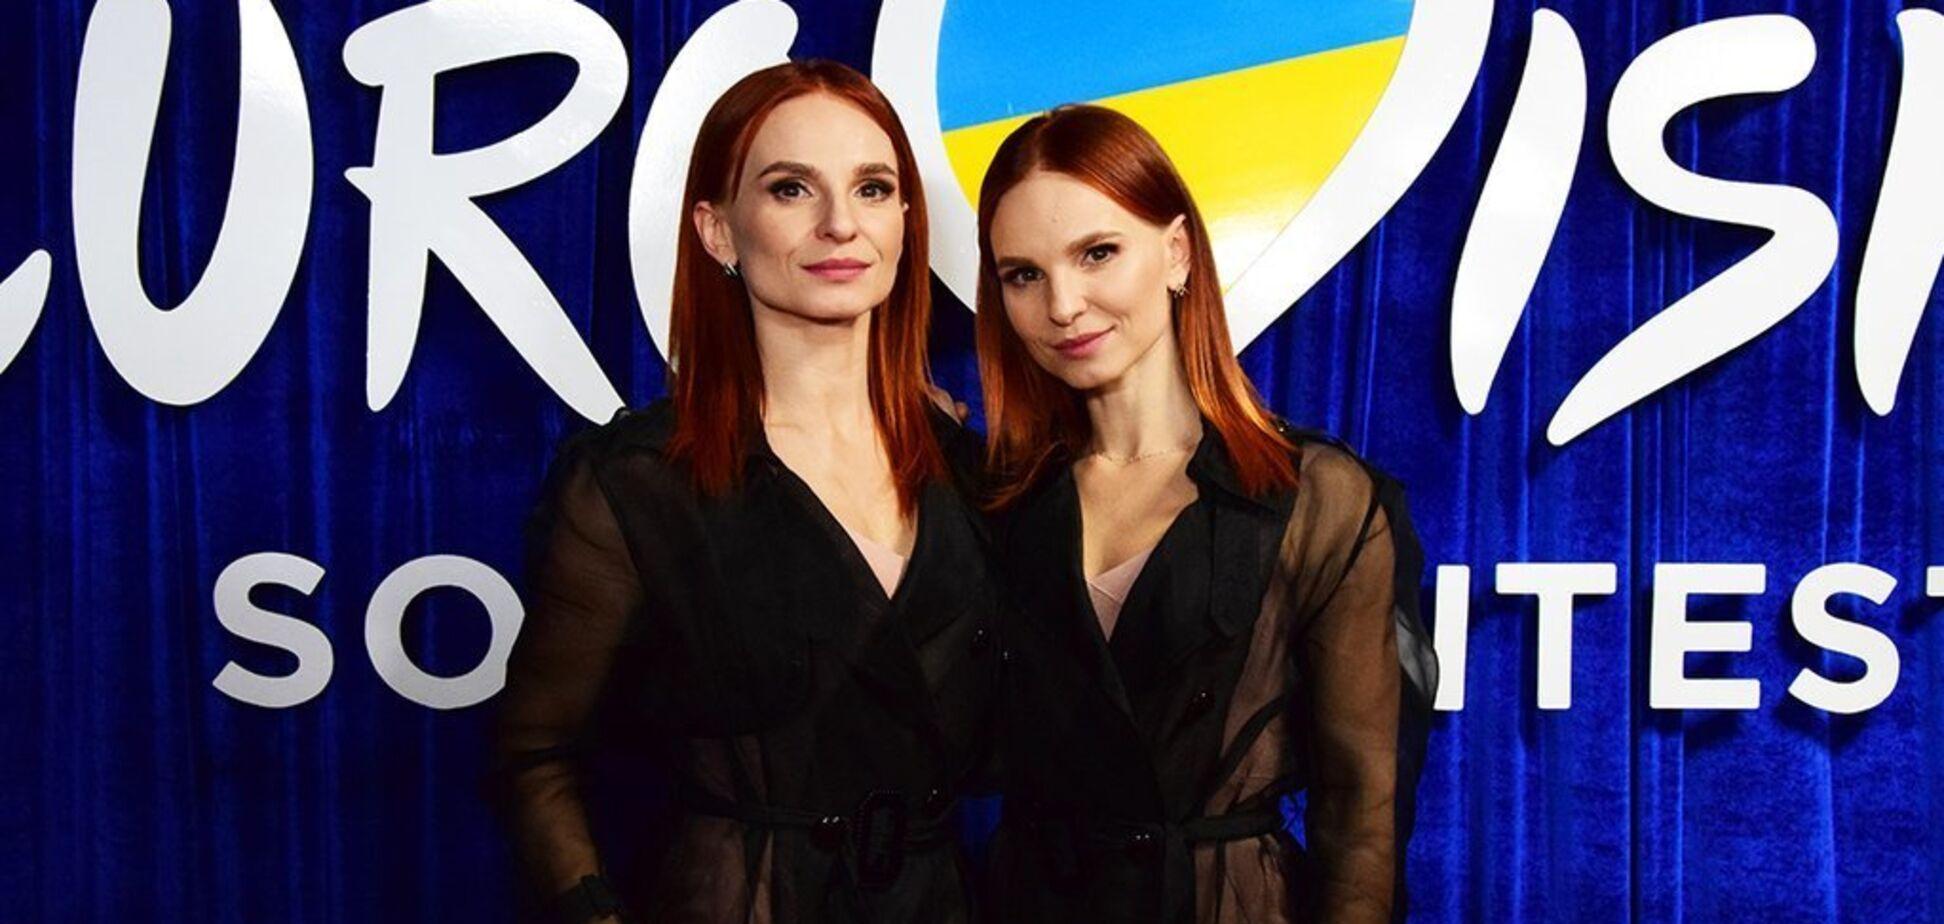 ''Україна втратила Крим'': претендентки на Євробачення потрапили в скандал